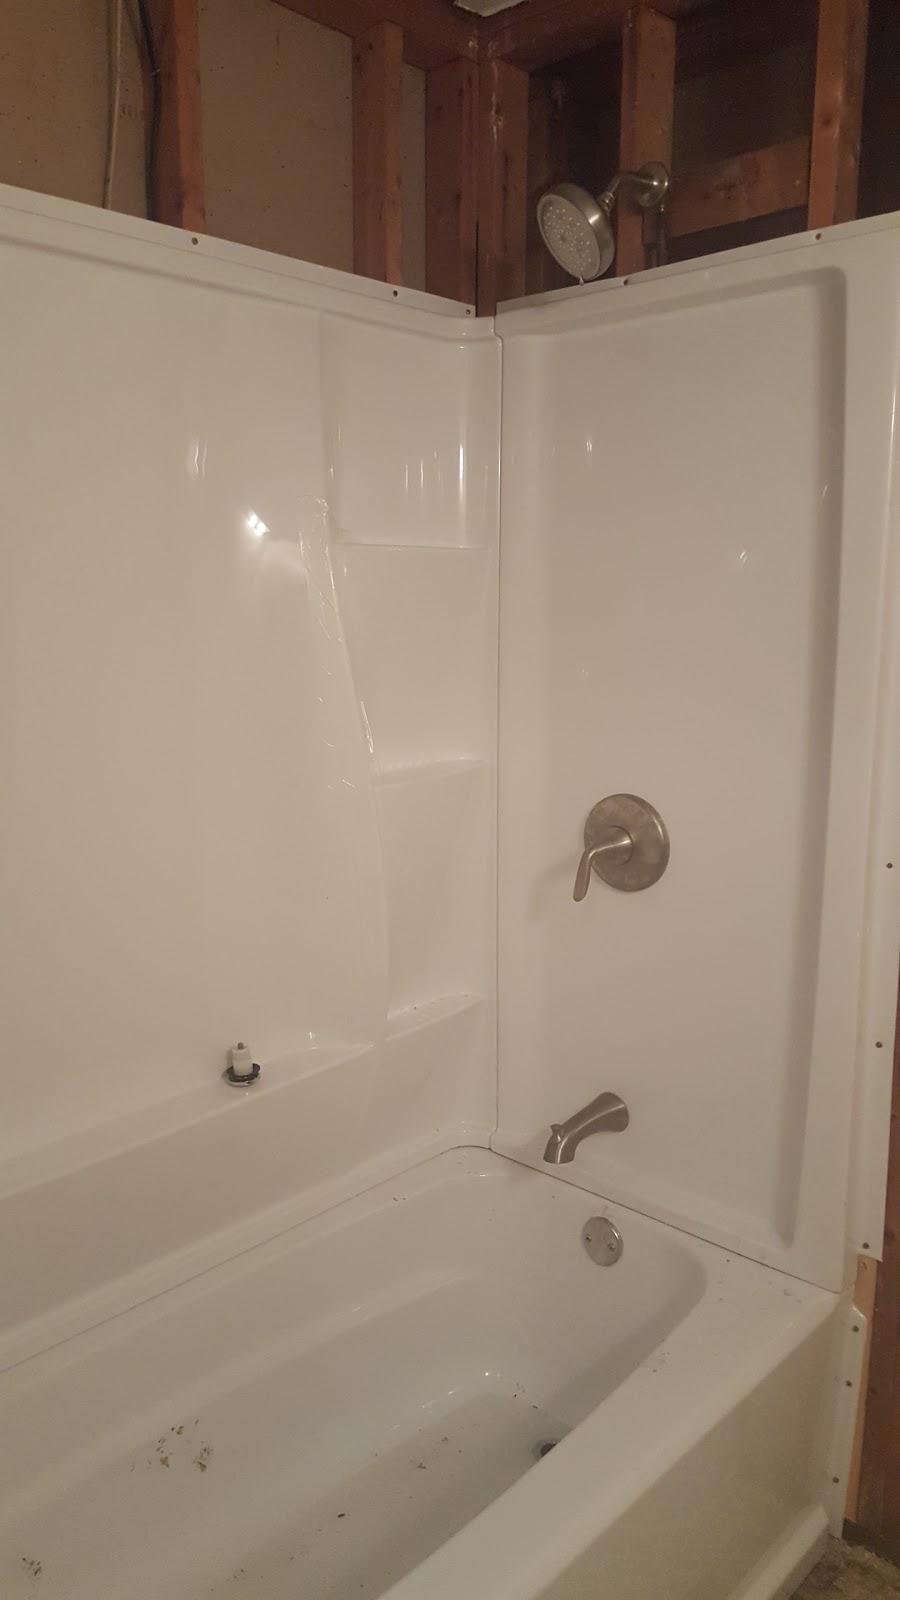 Dons Plumbing Repair And Drain Cleaning - plumber    Photo 4 of 10   Address: 1872 Saville Garden Ct, Virginia Beach, VA 23453, USA   Phone: (757) 309-0001